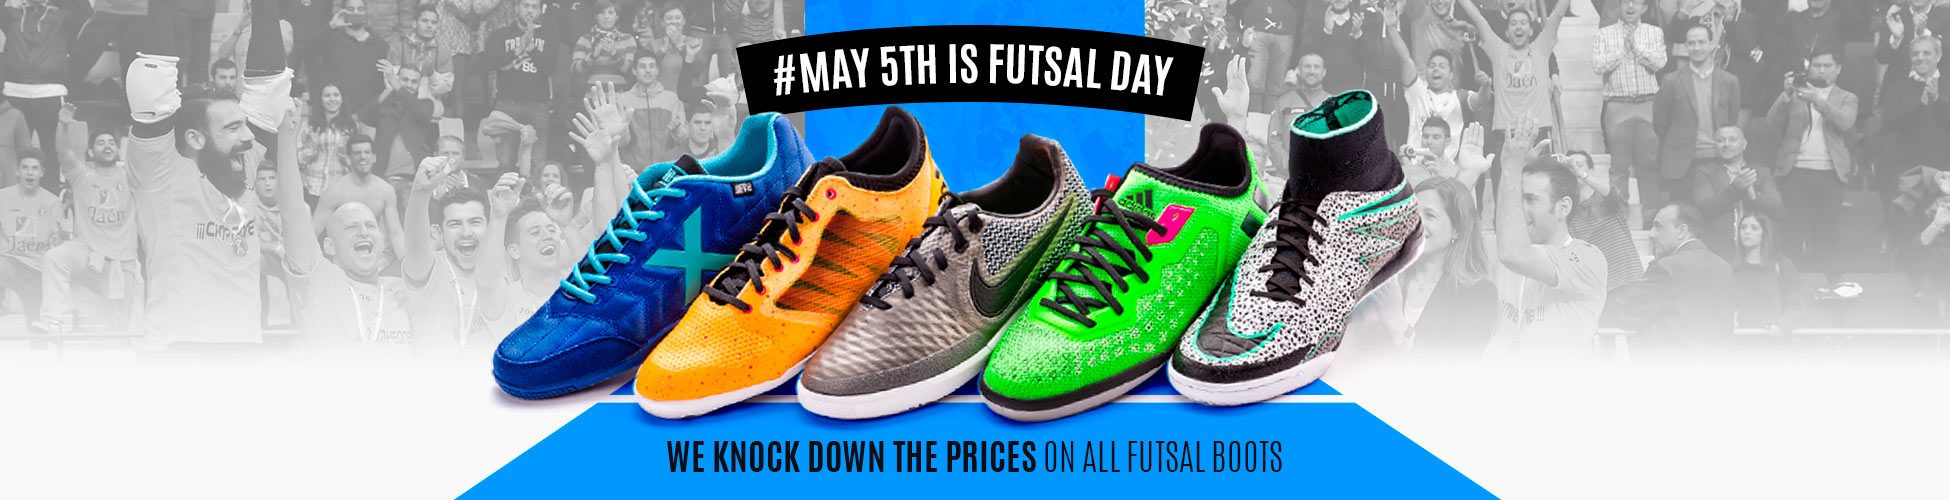 5x5 Futsal day